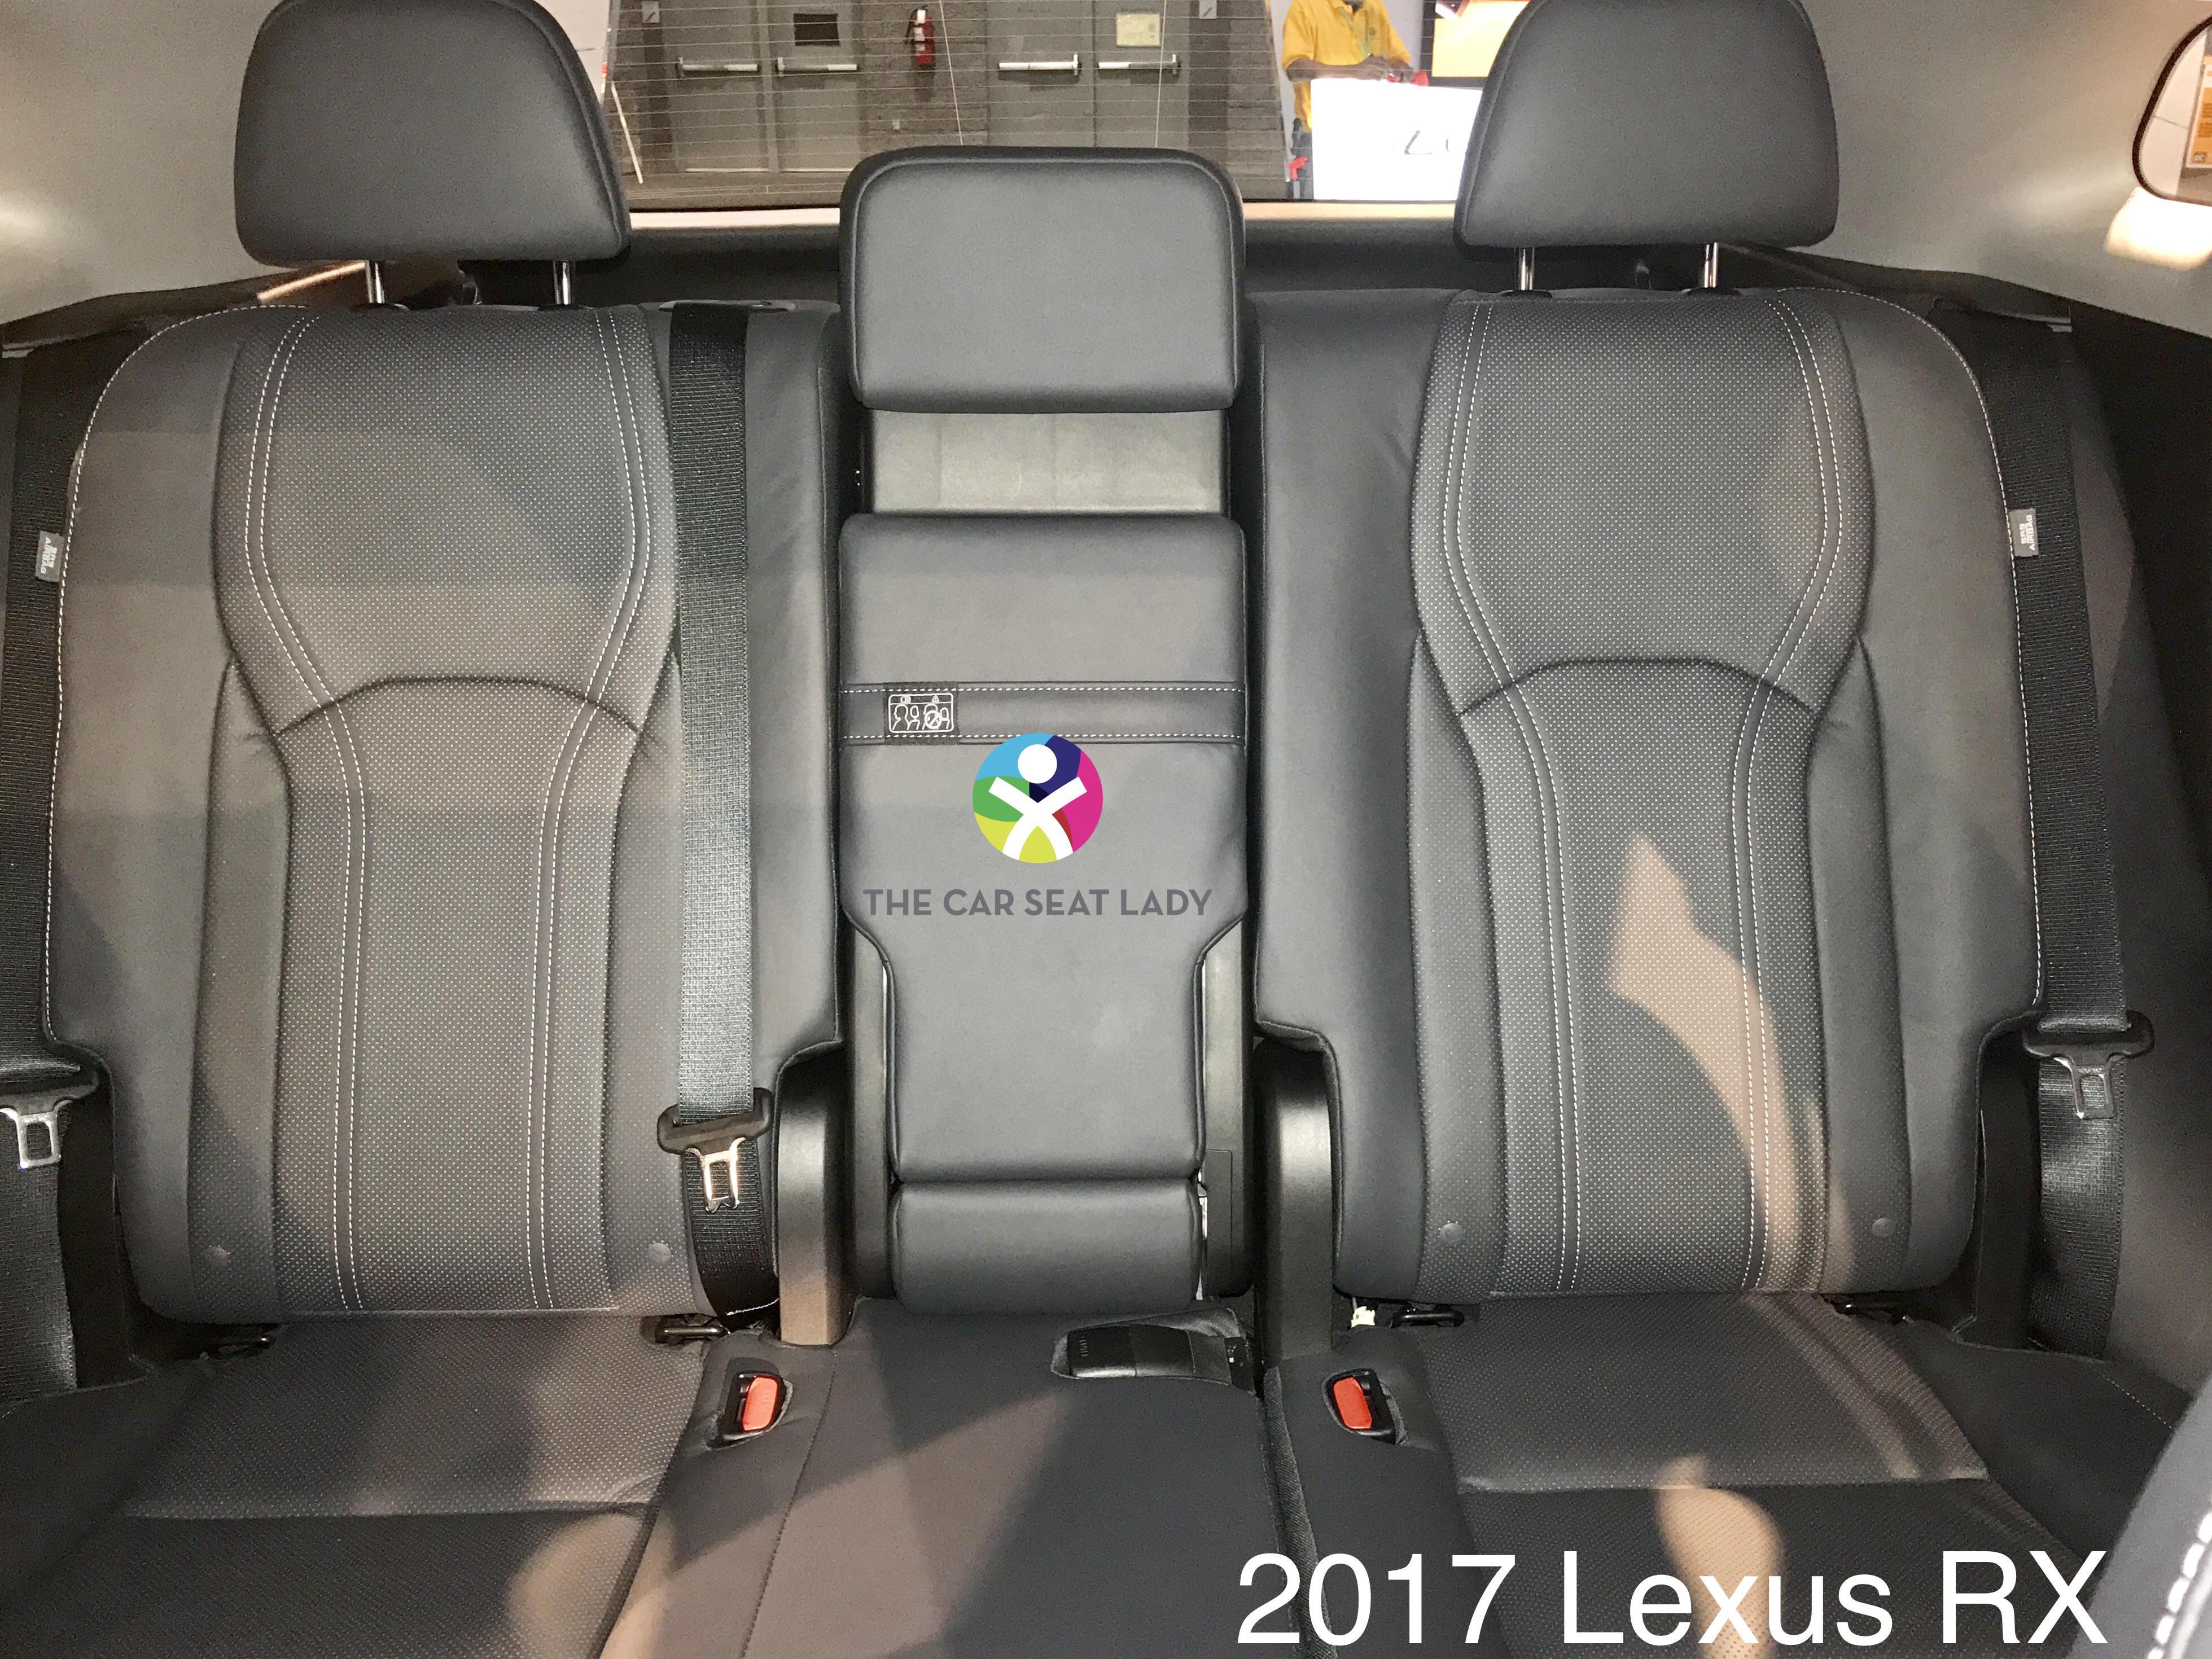 The Car Seat Lady Lexus Rx